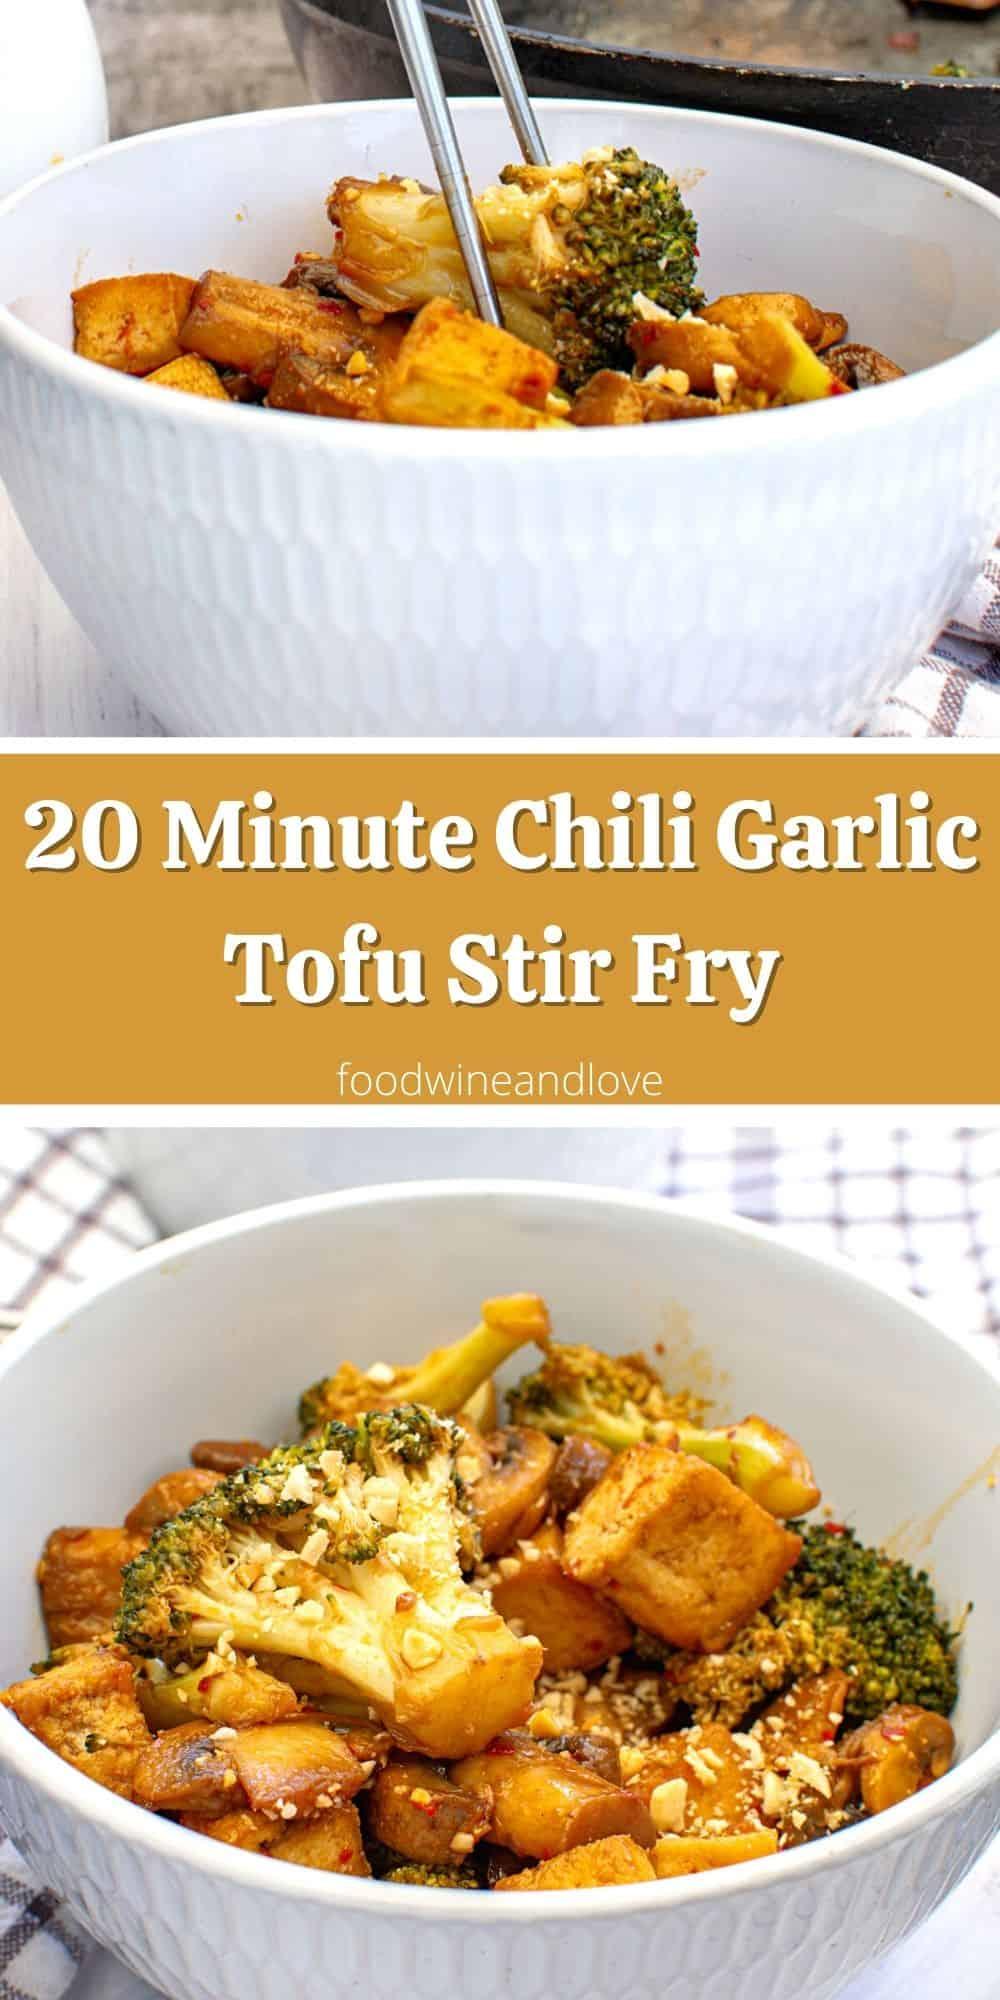 20 Minute Chili Garlic Tofu Stir Fry